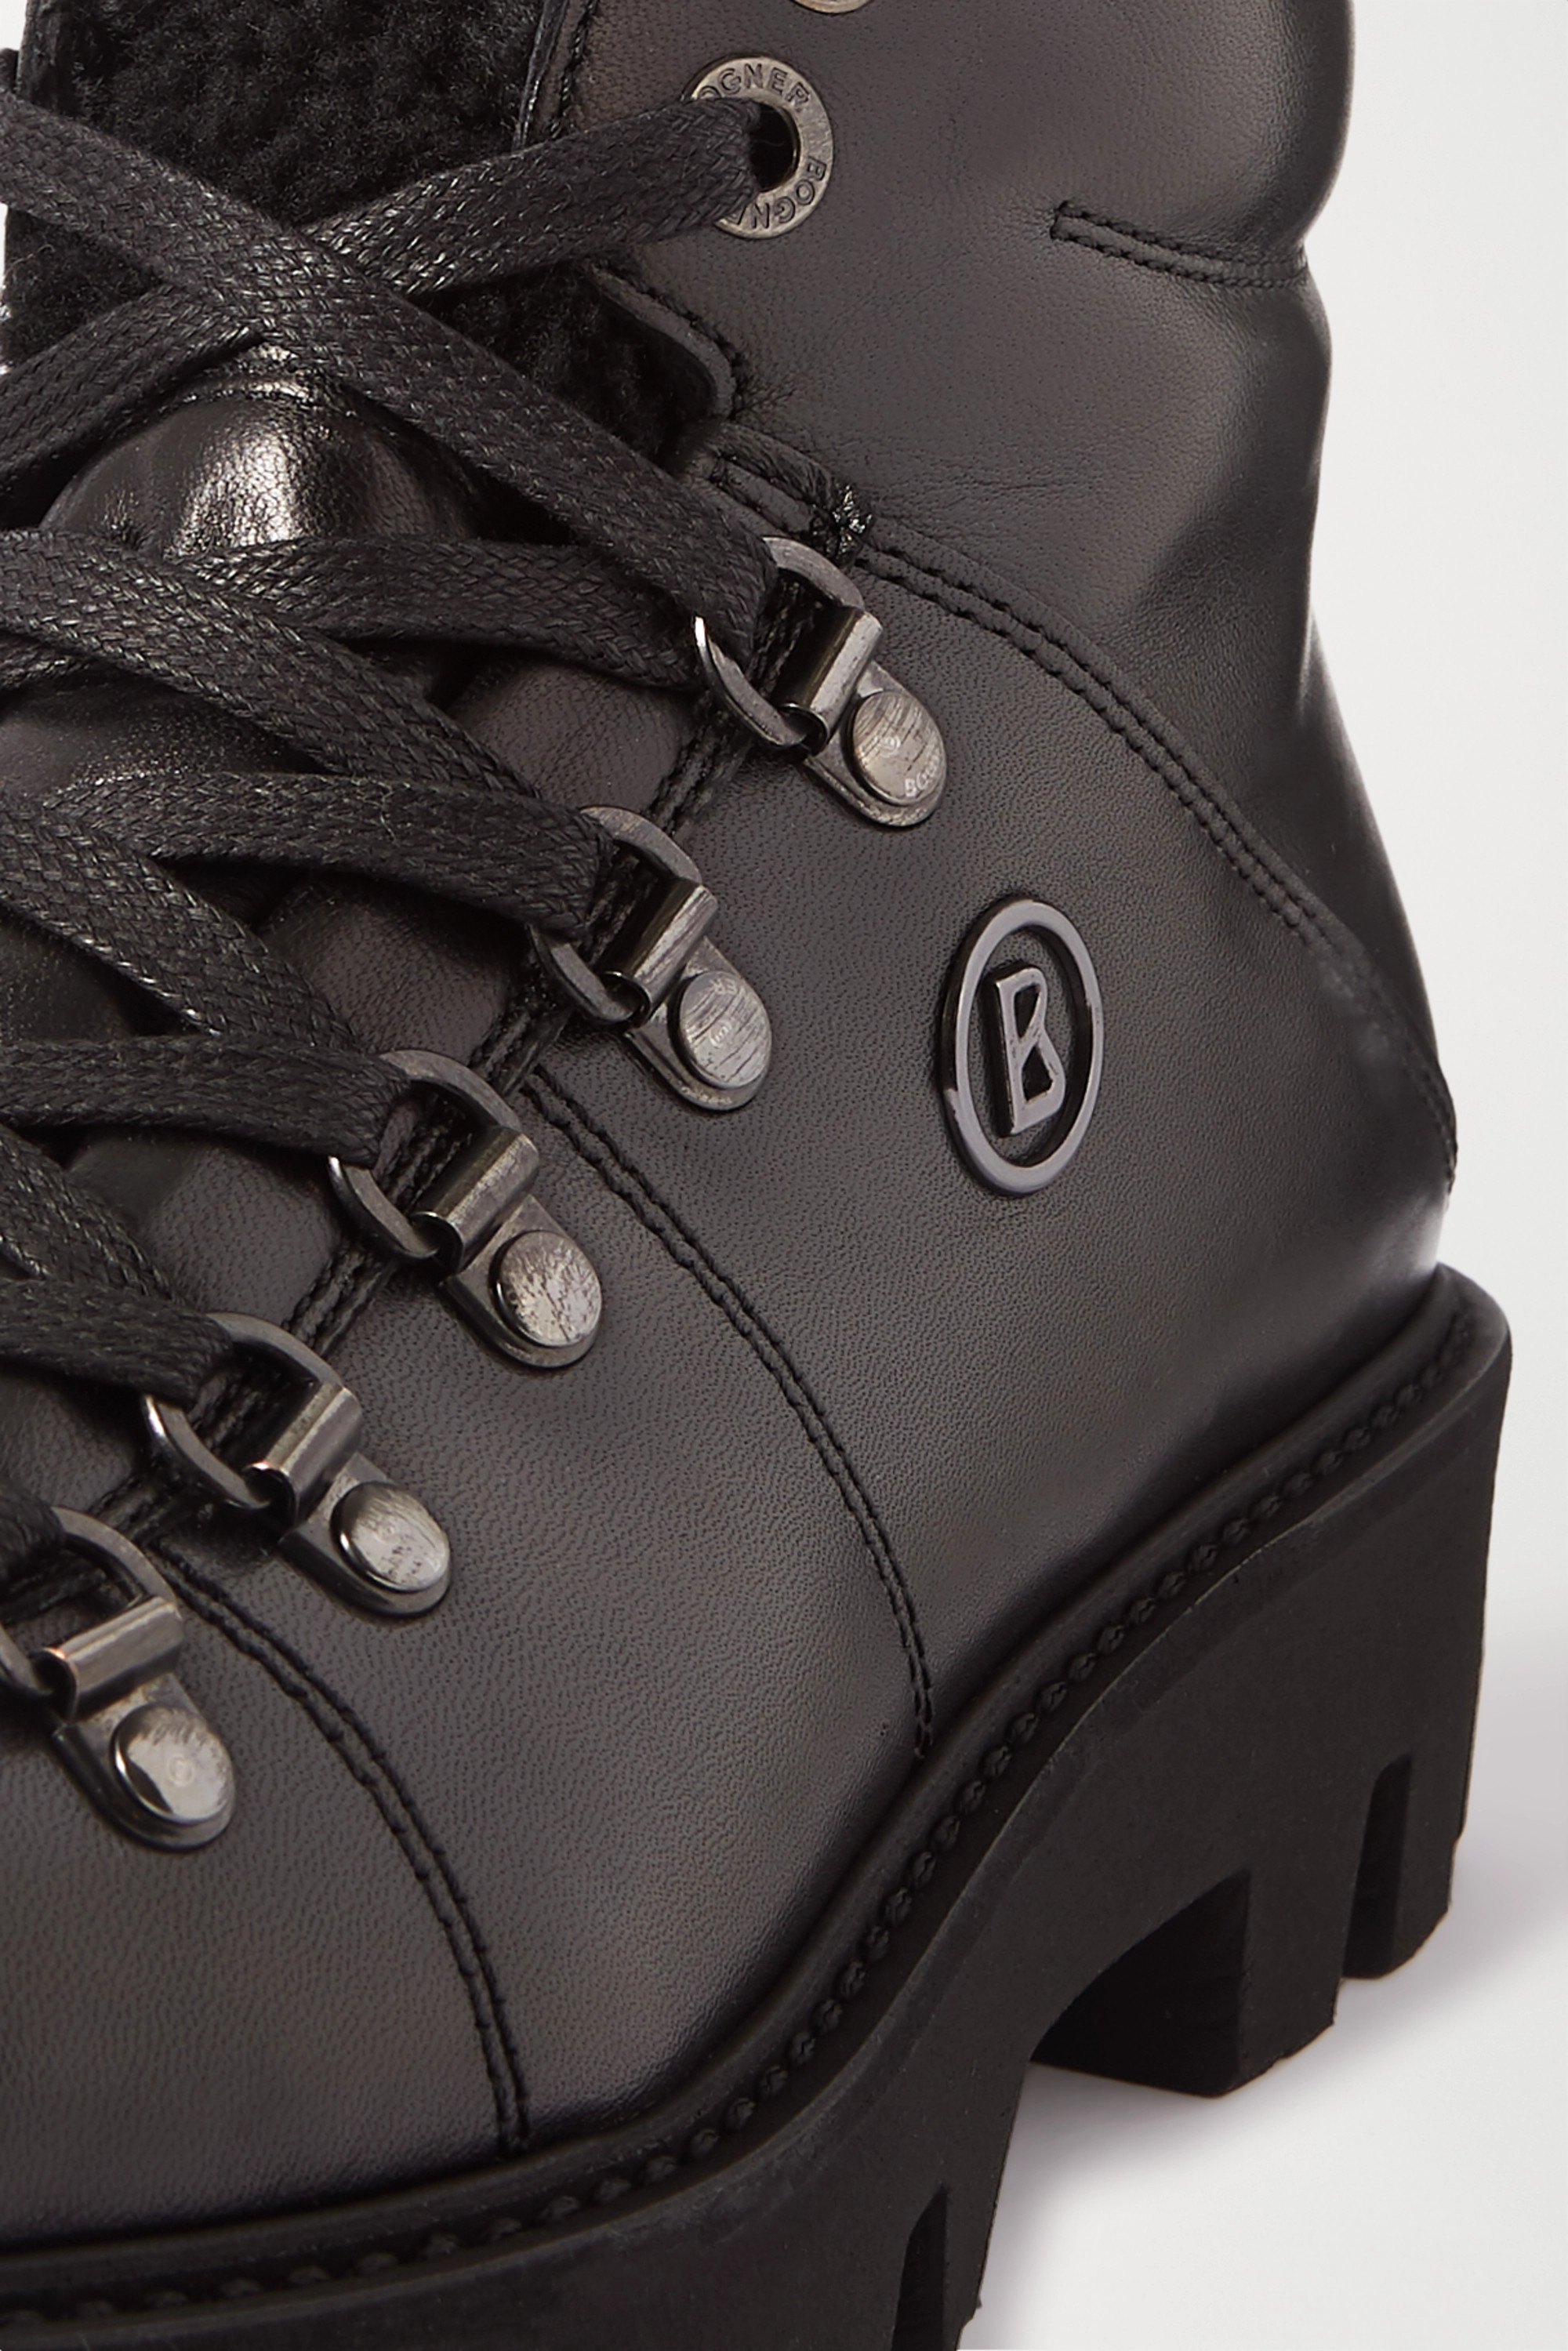 Bogner Copenhagen 羊毛皮衬里皮革踝靴